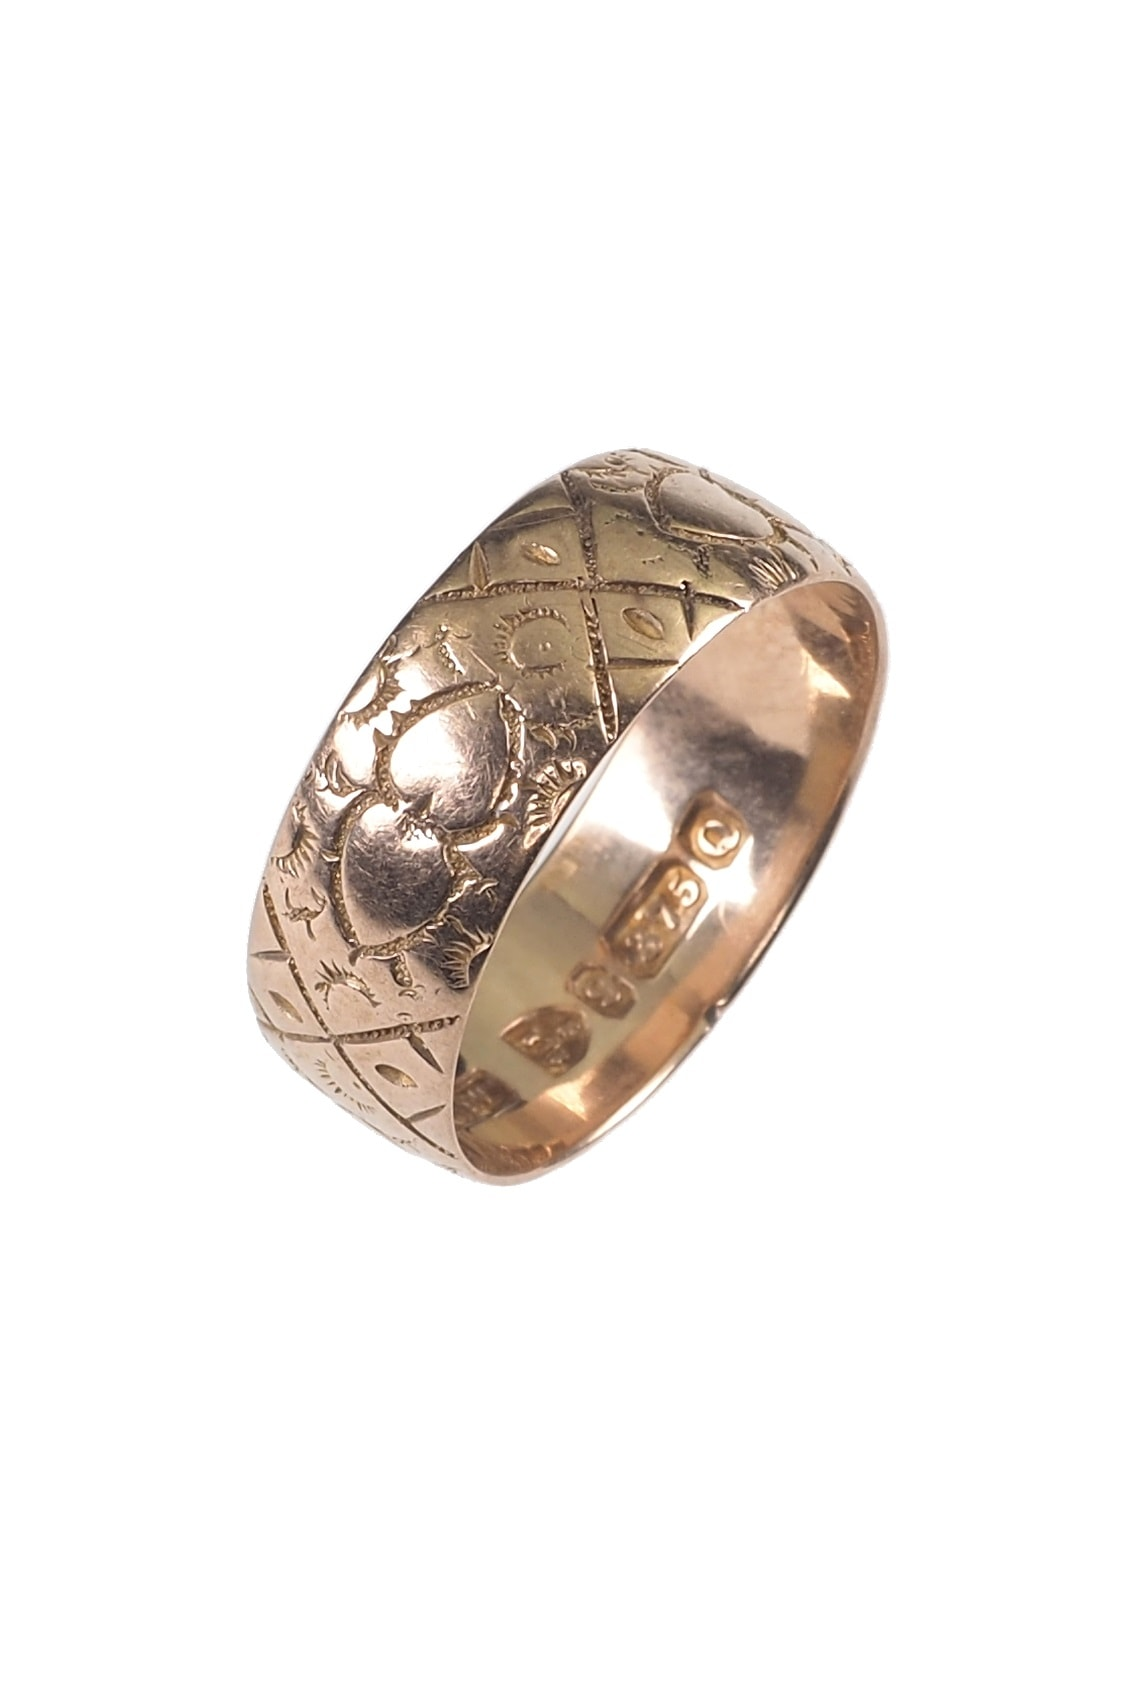 antike-Goldeheringe-kaufen-2293a